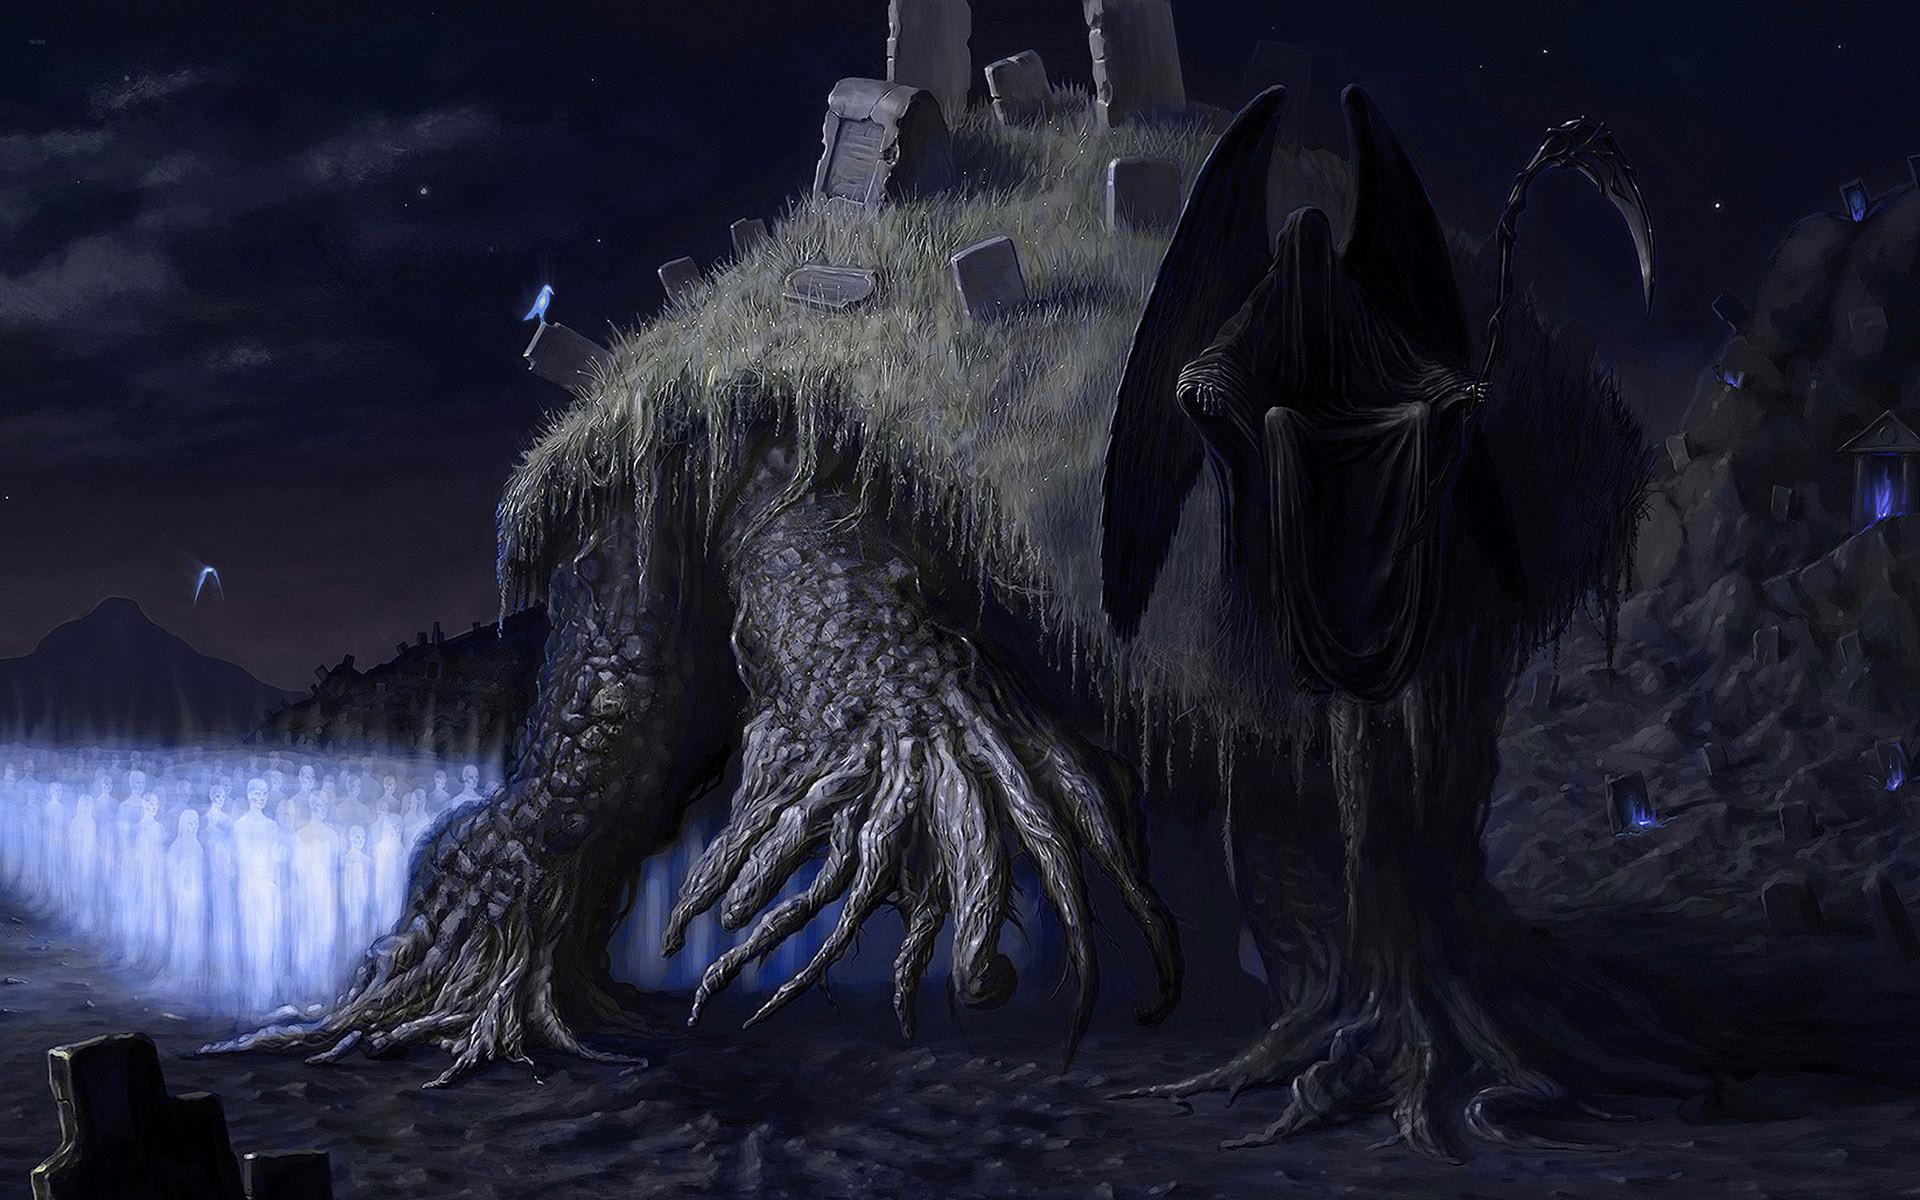 Dark Grim Reaper Wallpaper 1920x1200 Dark Grim Reaper 1920x1200